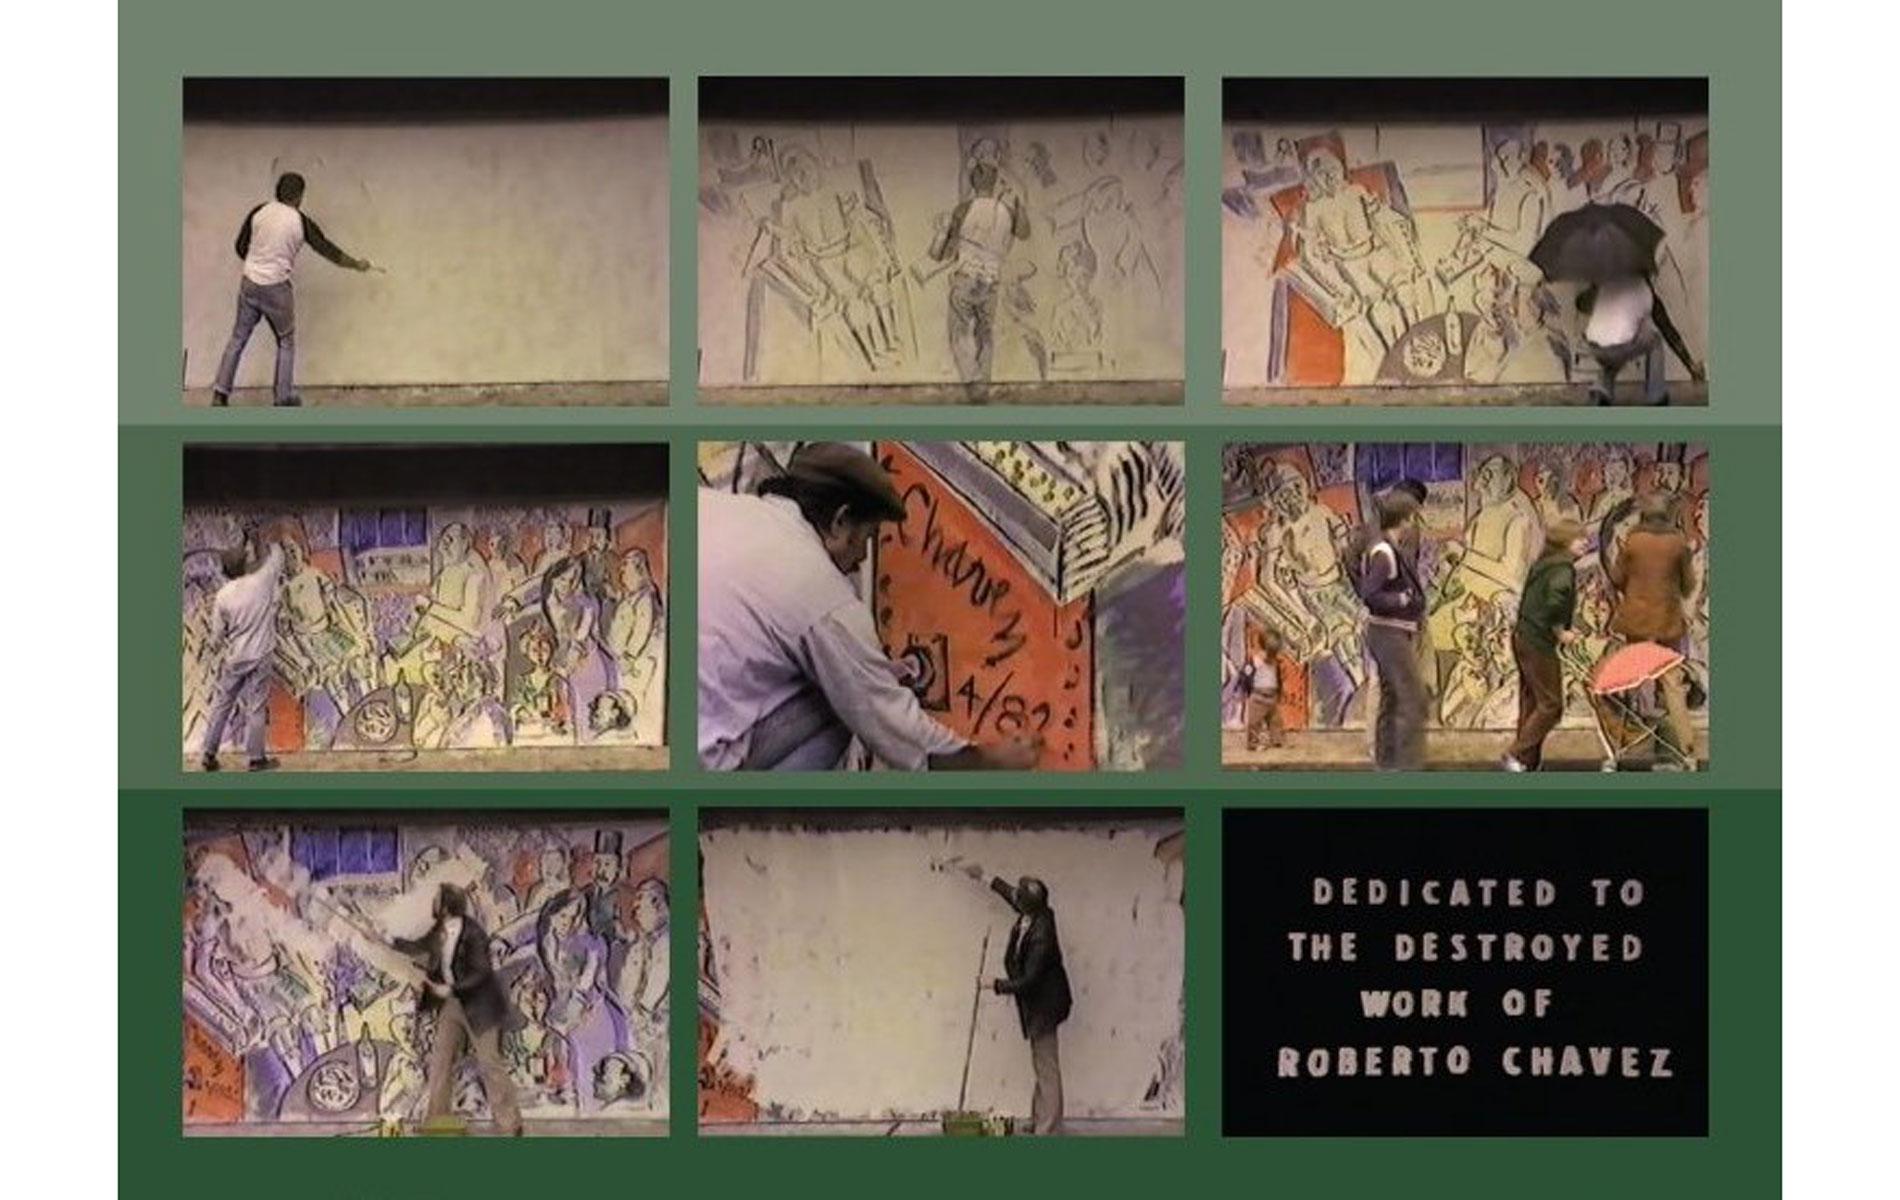 <h1>Video stills of Jeff Boice and Roberto Chavez's, <em>The Execution</em>, 1982</h1>